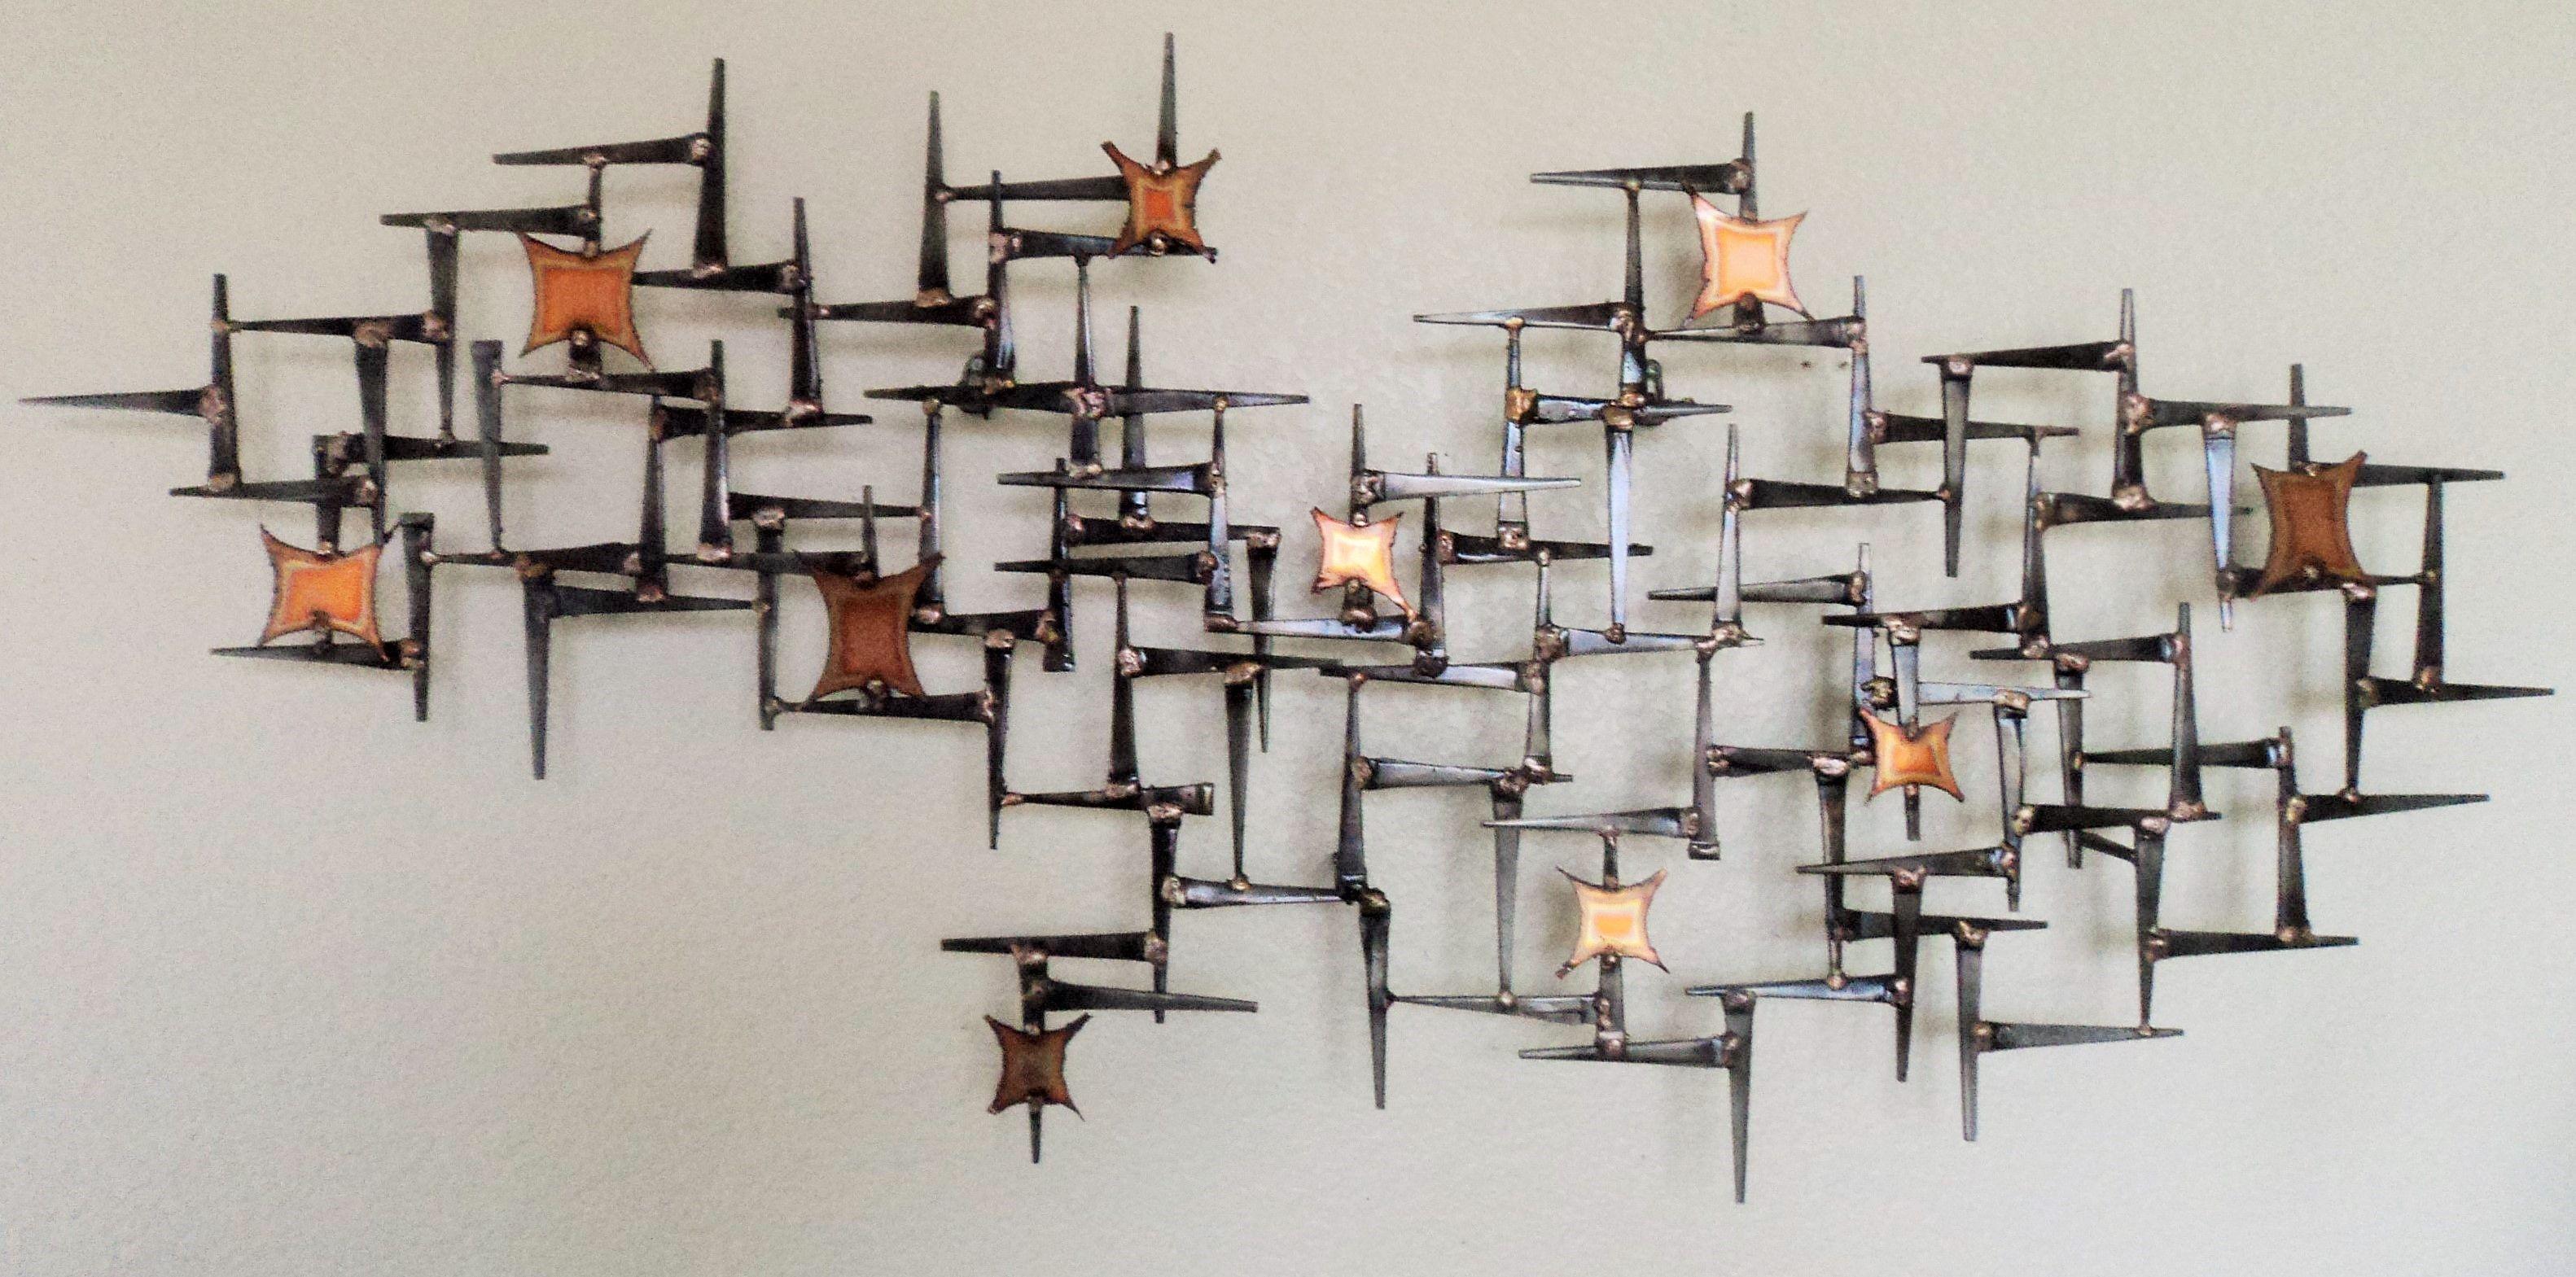 MID CENTURY MODERN WALL SCULPTURE CREATED BY ARTIST COREY ELLIS